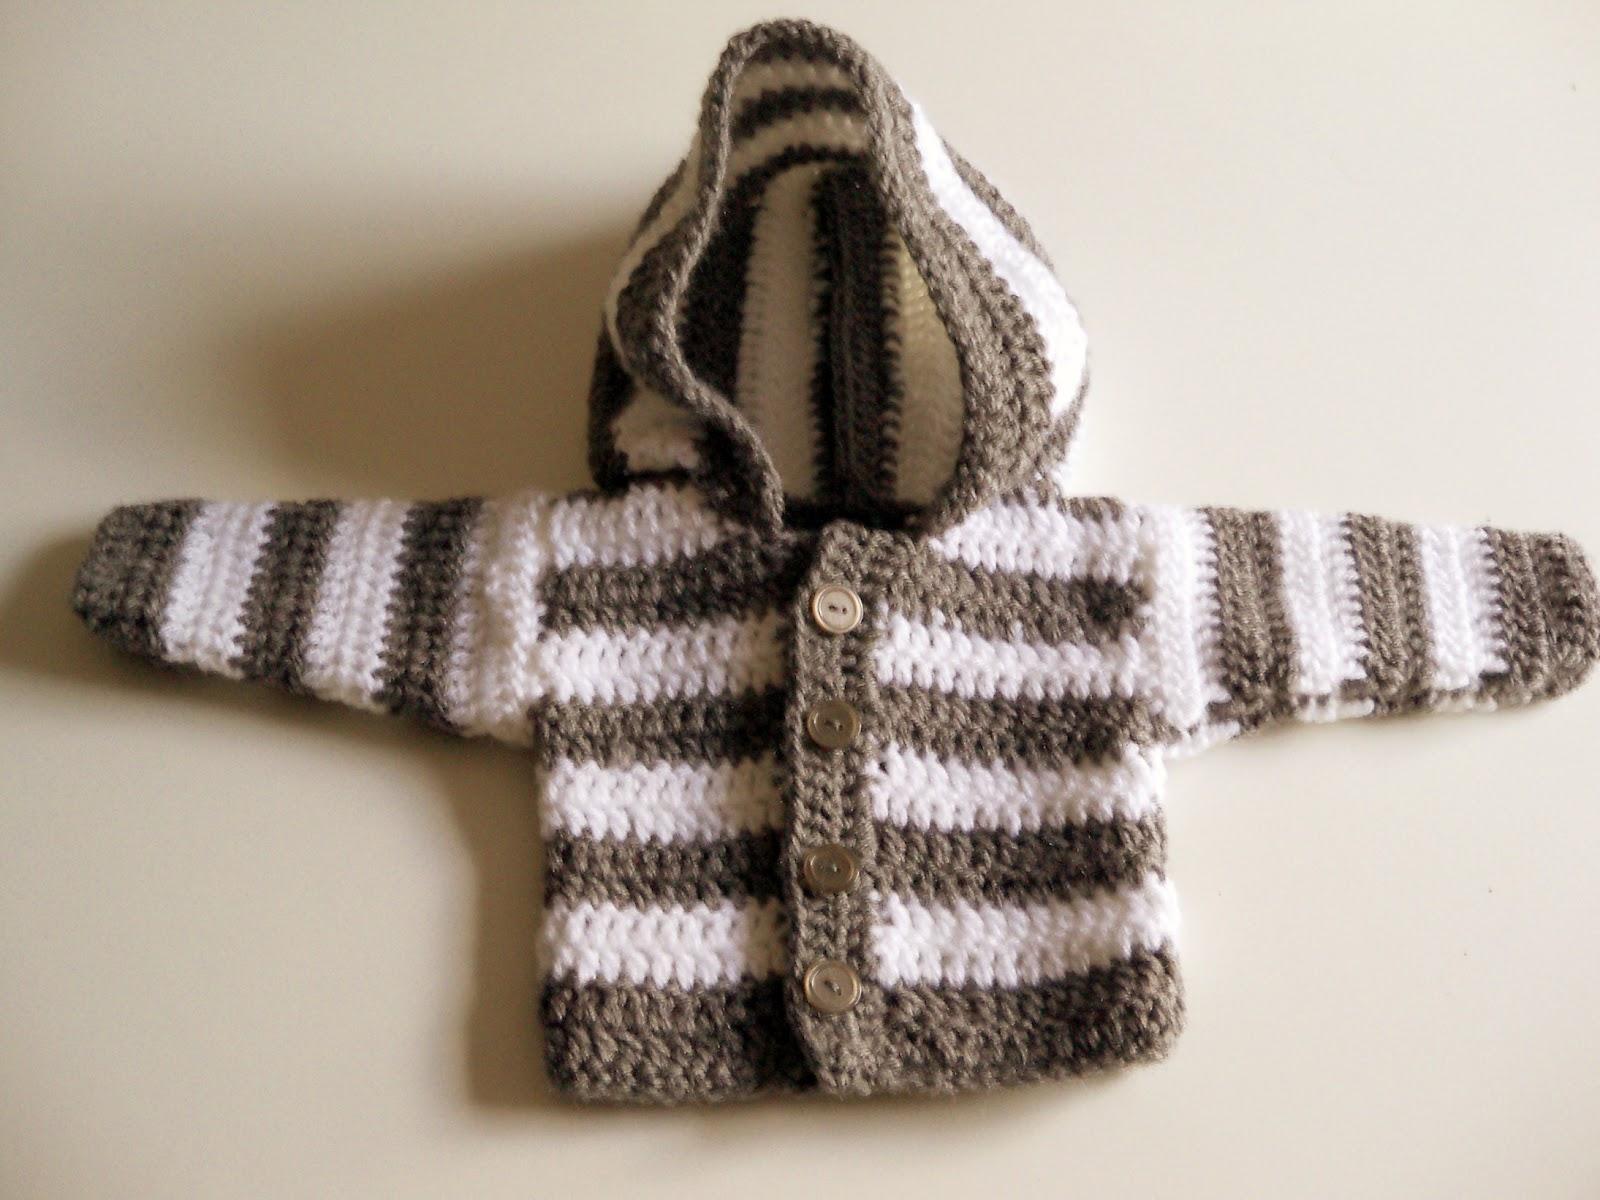 Crochet Newborn Baby Shoes Pattern For Beginners